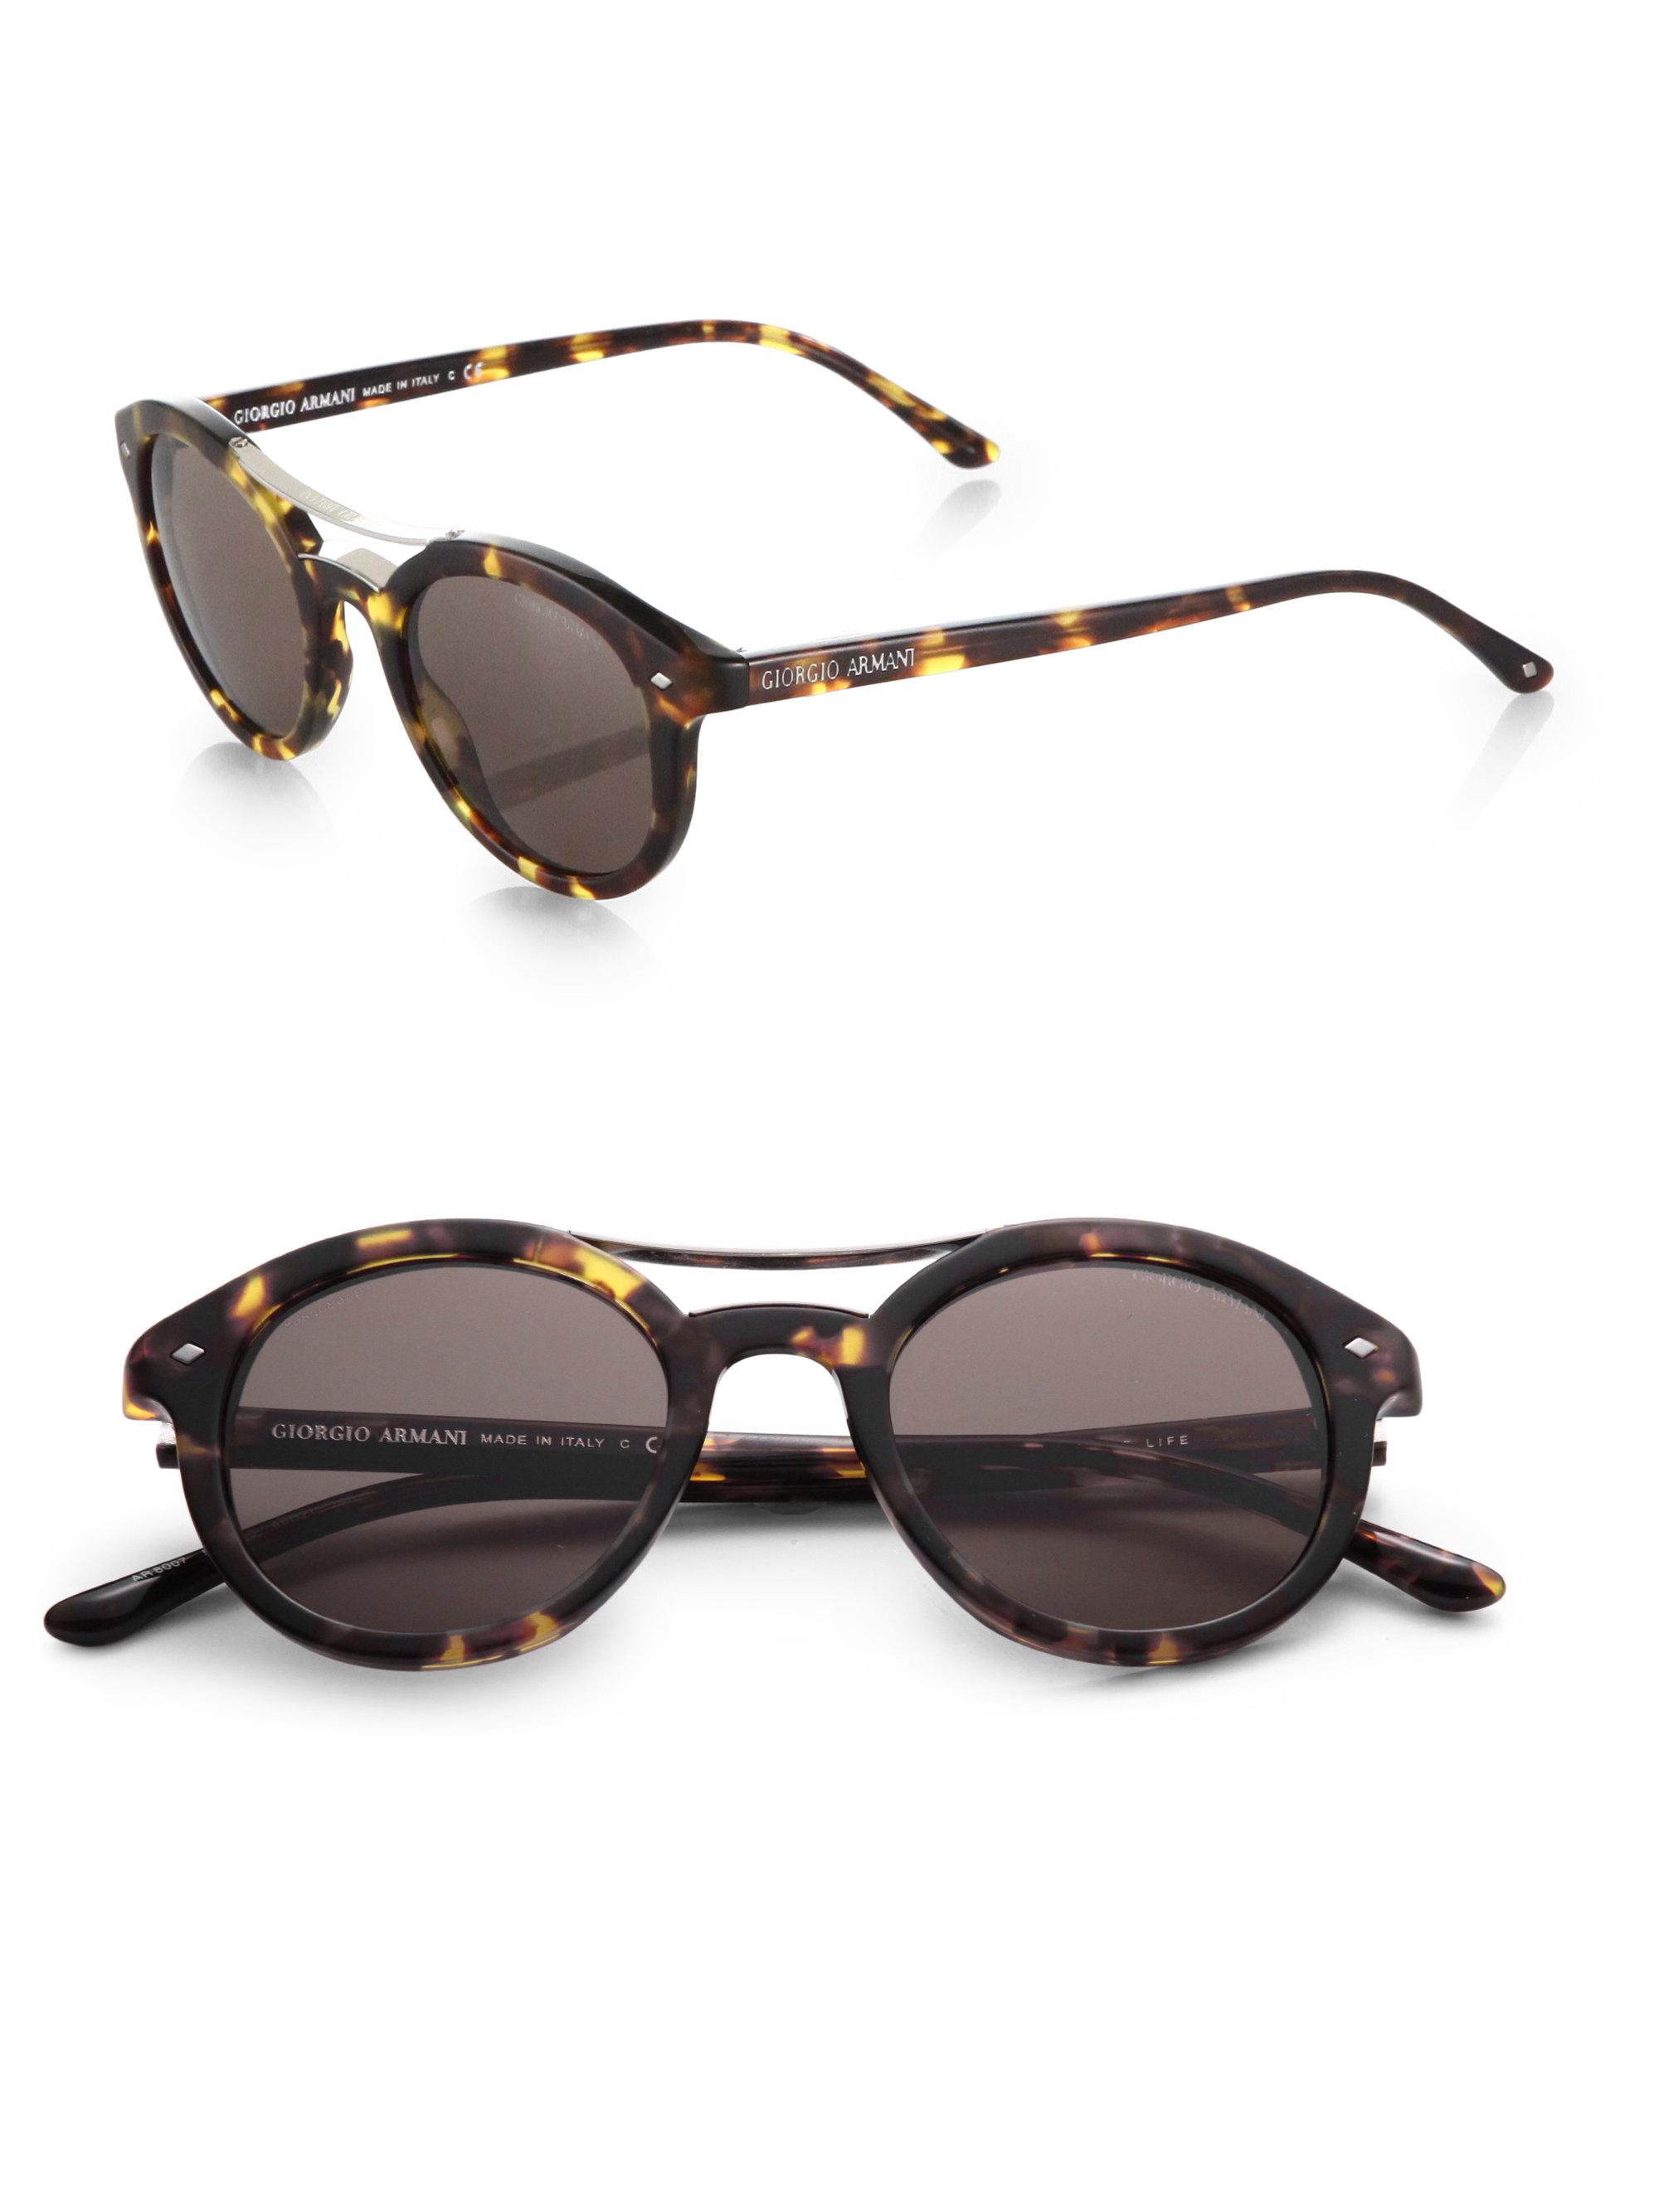 Brow Bar Sunglasses  giorgio armani round brow bar sunglasses in brown for men lyst